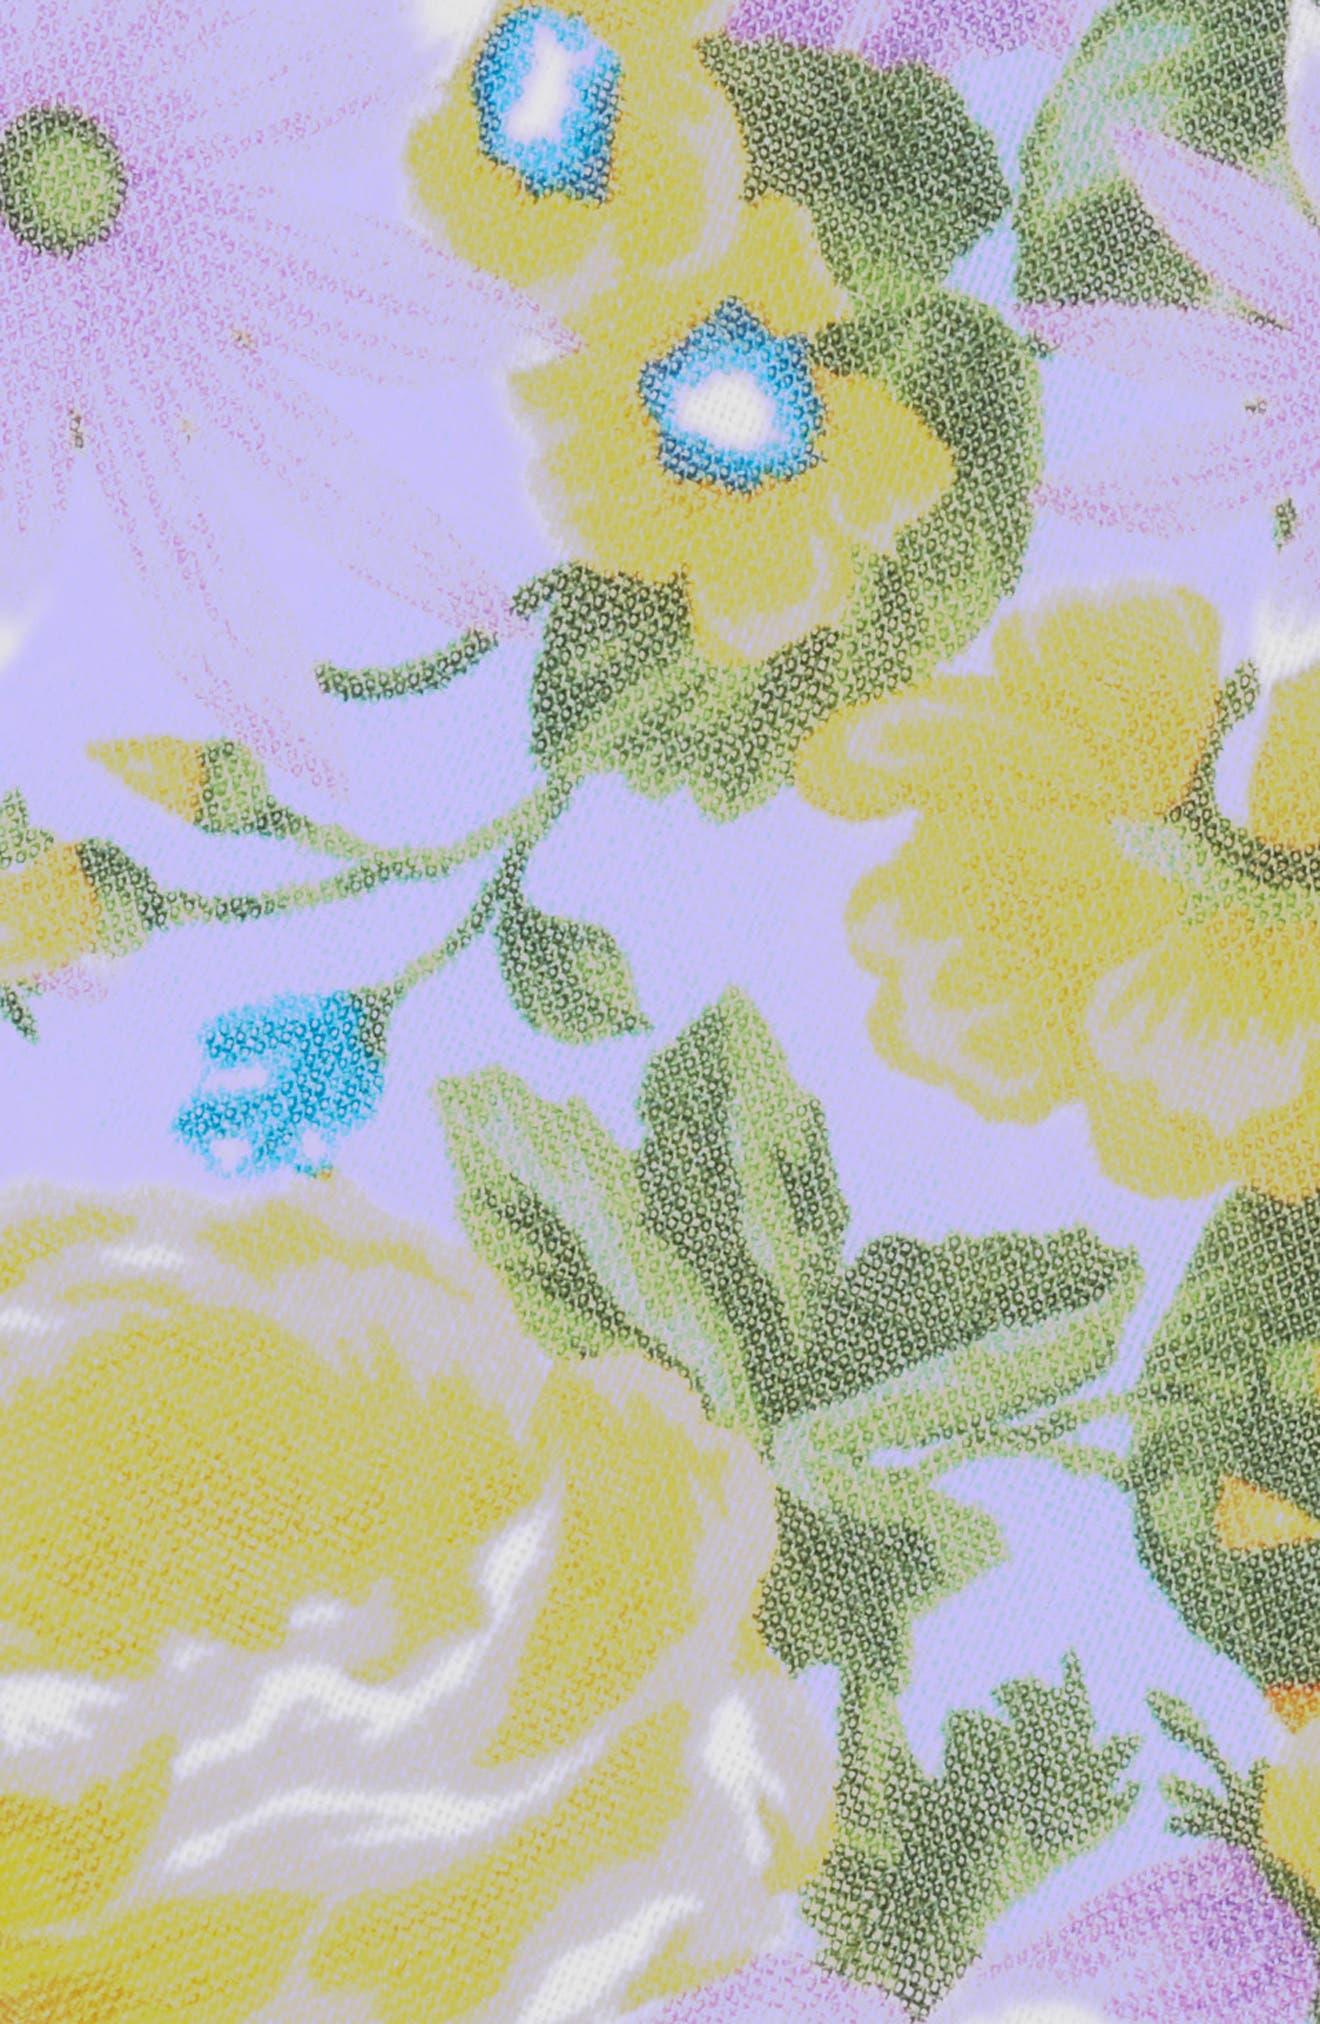 Duke Floral Linen Tie,                             Alternate thumbnail 2, color,                             LIGHT BLUE